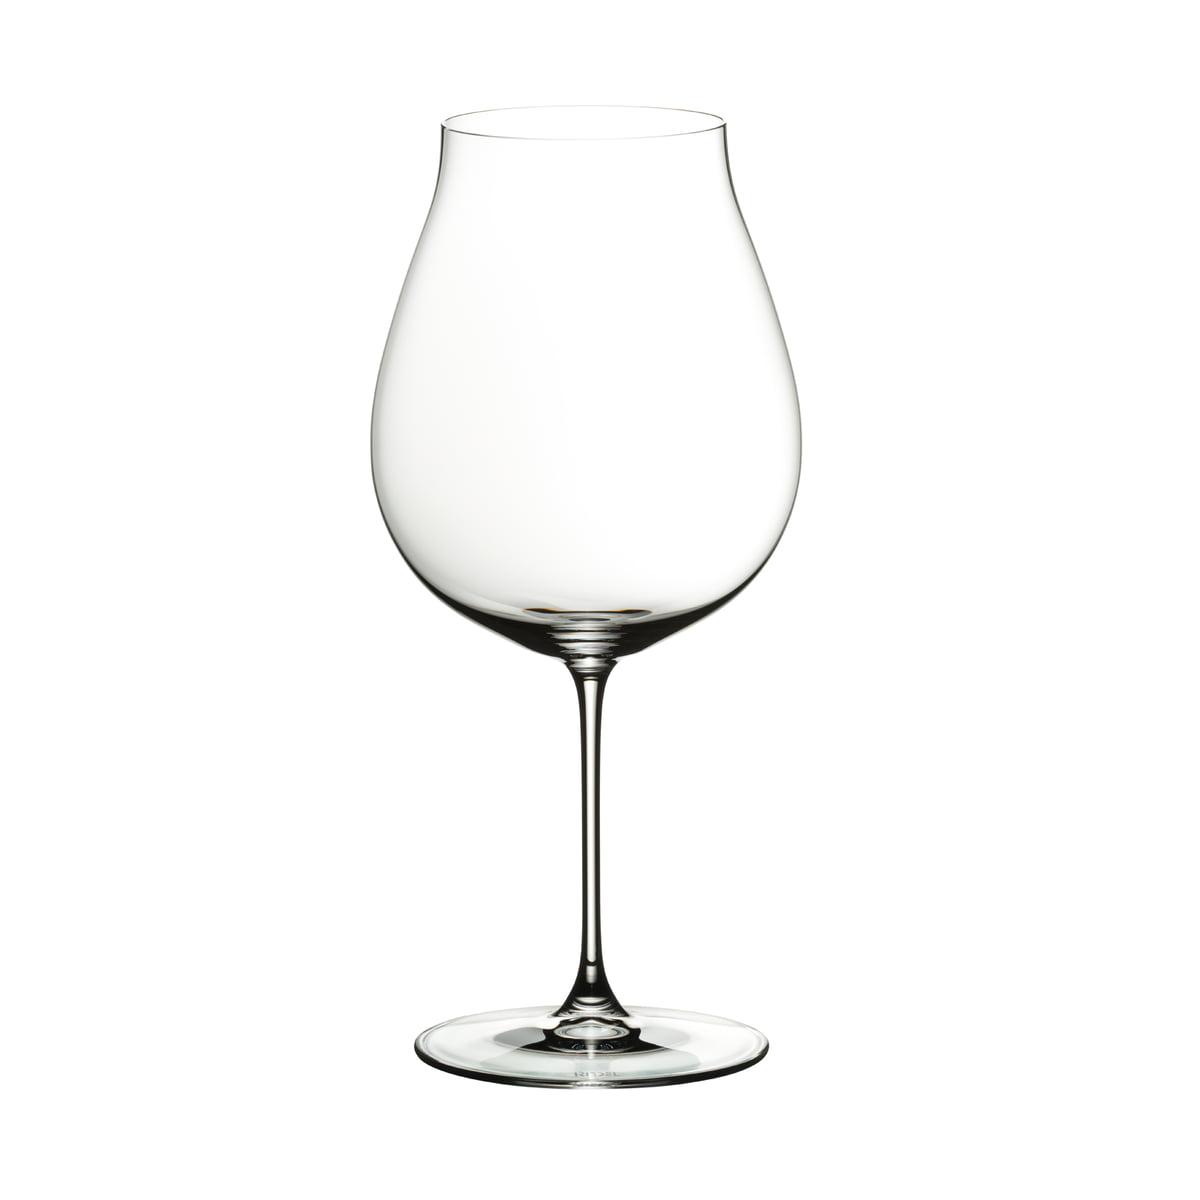 e02af427cc73 Riedel - Veritas New World Pinot Noir Nebbiolo Rosé Champagne Glass